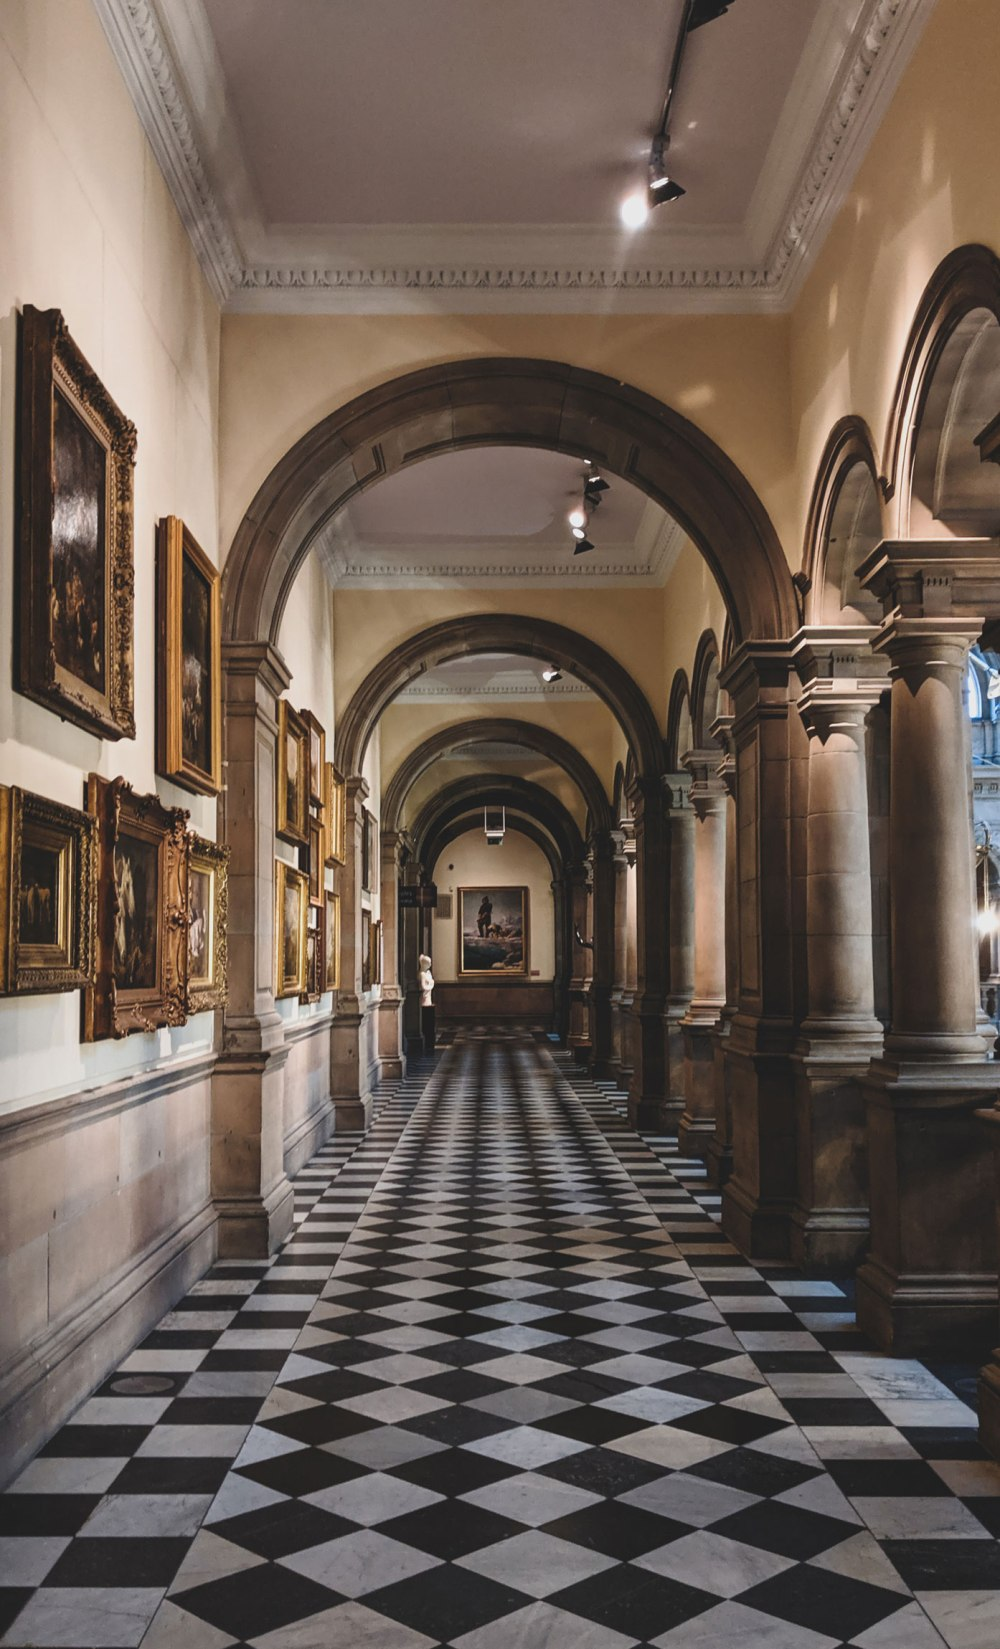 Kelvingrove-Art-Gallery-and-Museum-Glasgow (14)